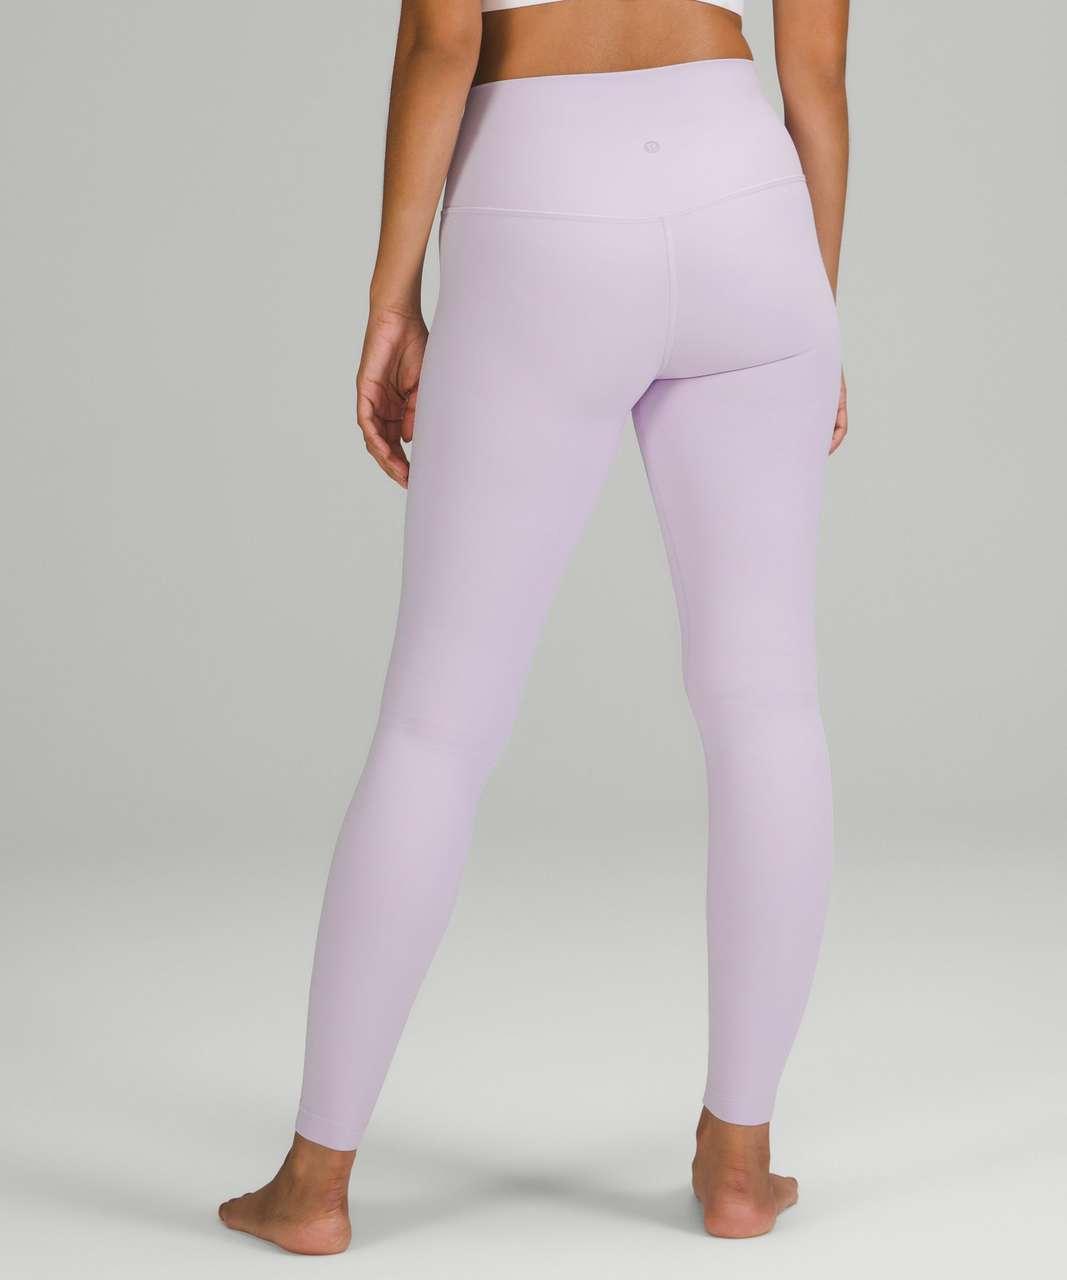 "Lululemon Align High-Rise Pant 28"" - Lavender Dew"